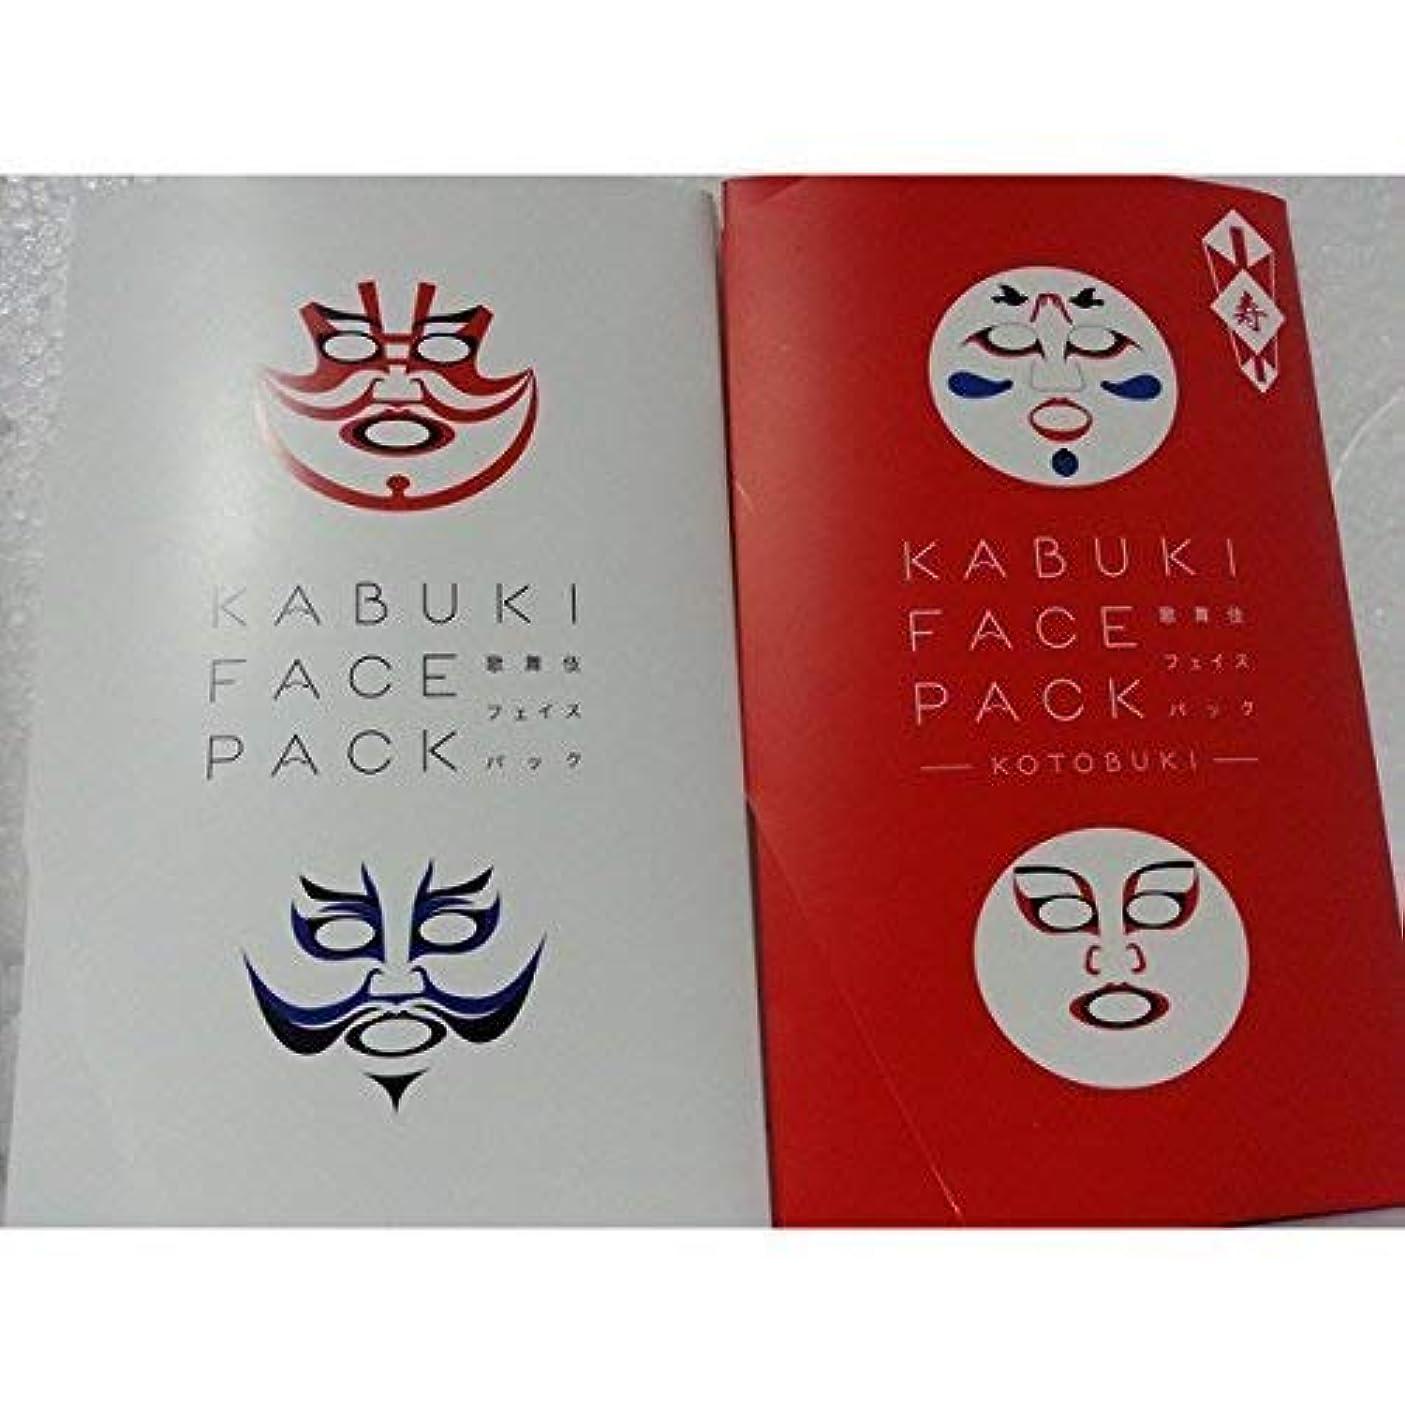 リングレットクレタ放送歌舞伎フェイスパック&歌舞伎フェイスパック寿 KABUKI FACE PACK&KABUKI FACE PACK KOTOBUKI